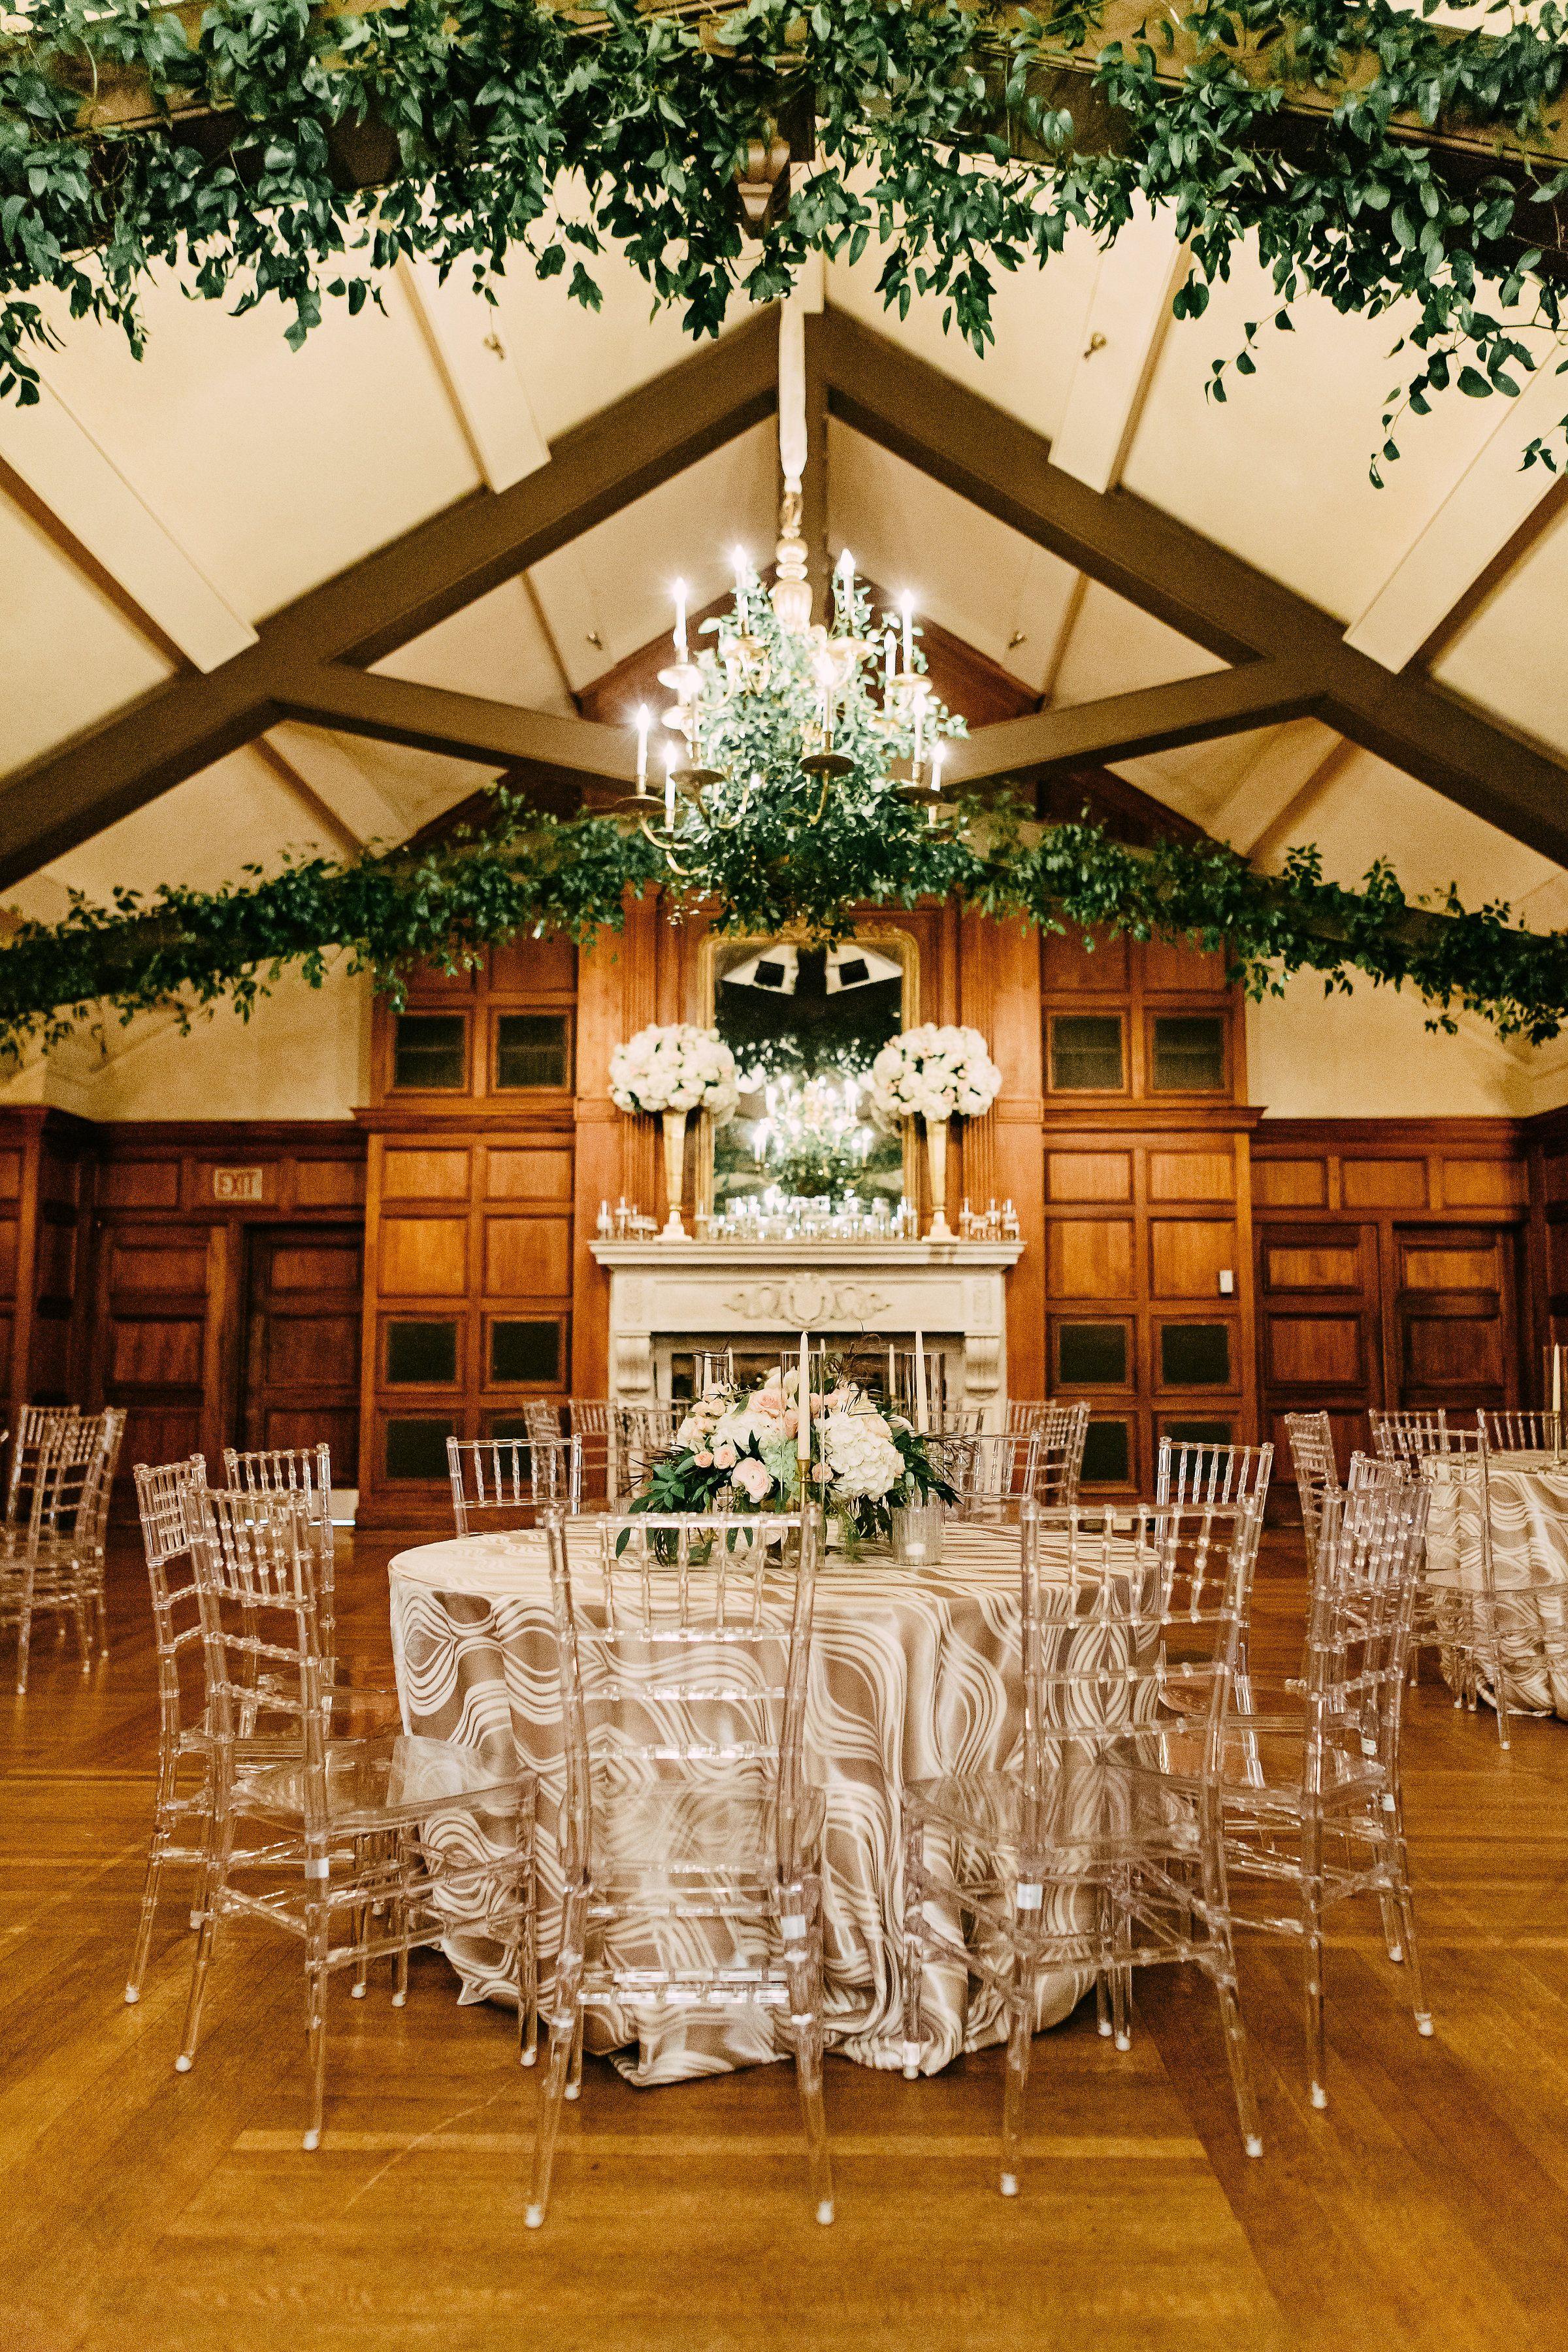 Clear Acrylic Rustic Wood Romantic Wedding Reception Dining